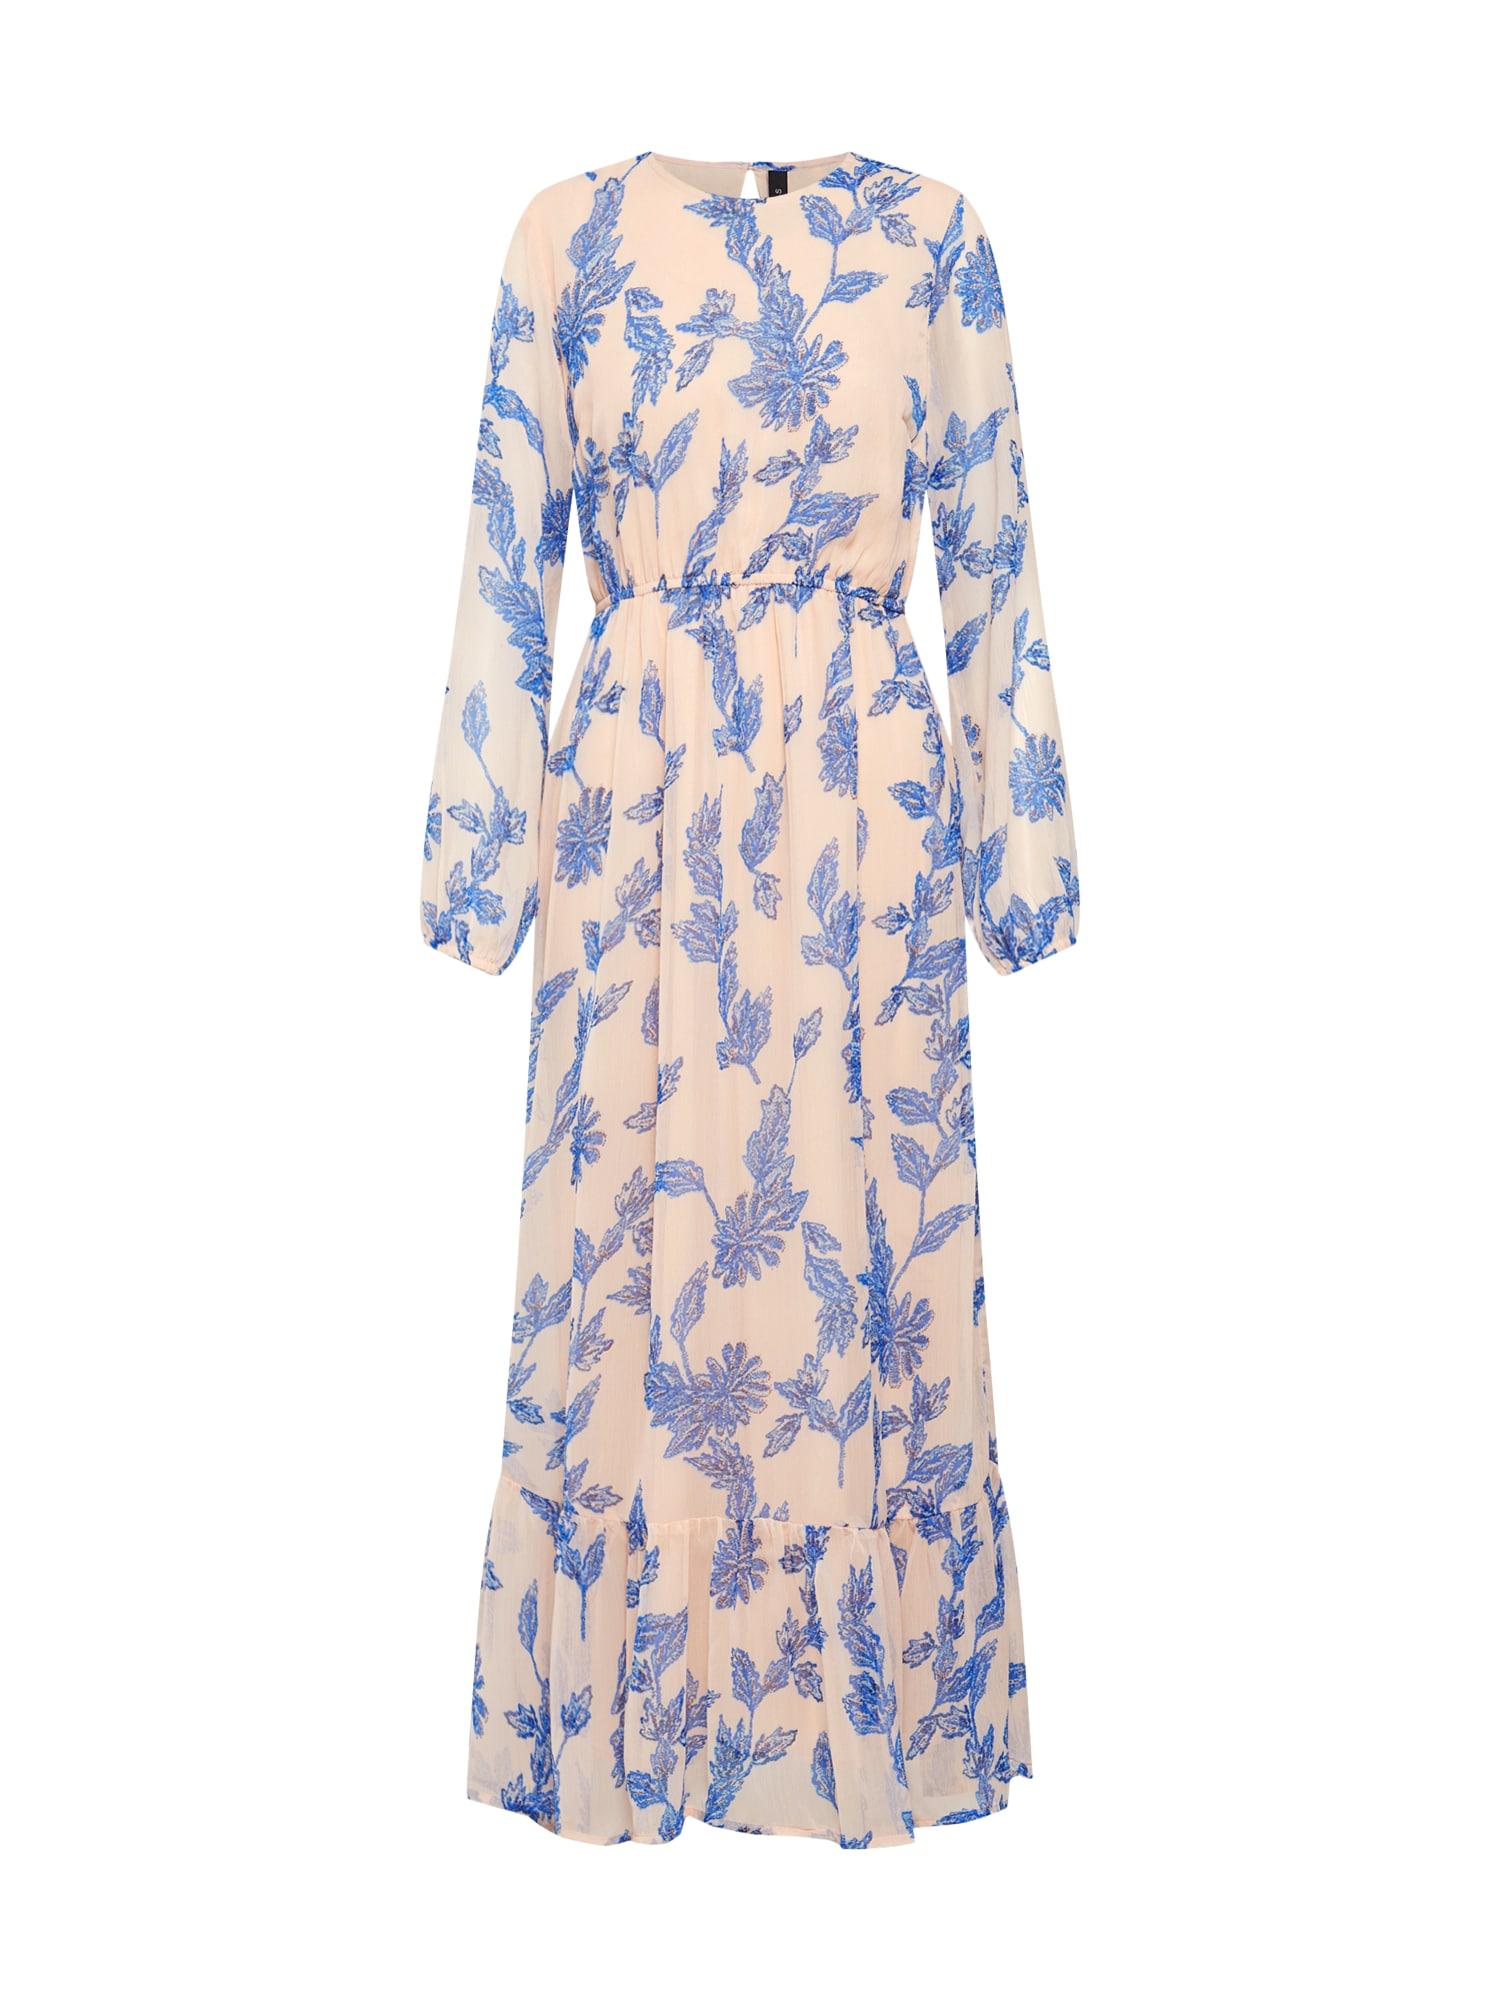 Šaty BEATEA modrá broskvová Y.A.S